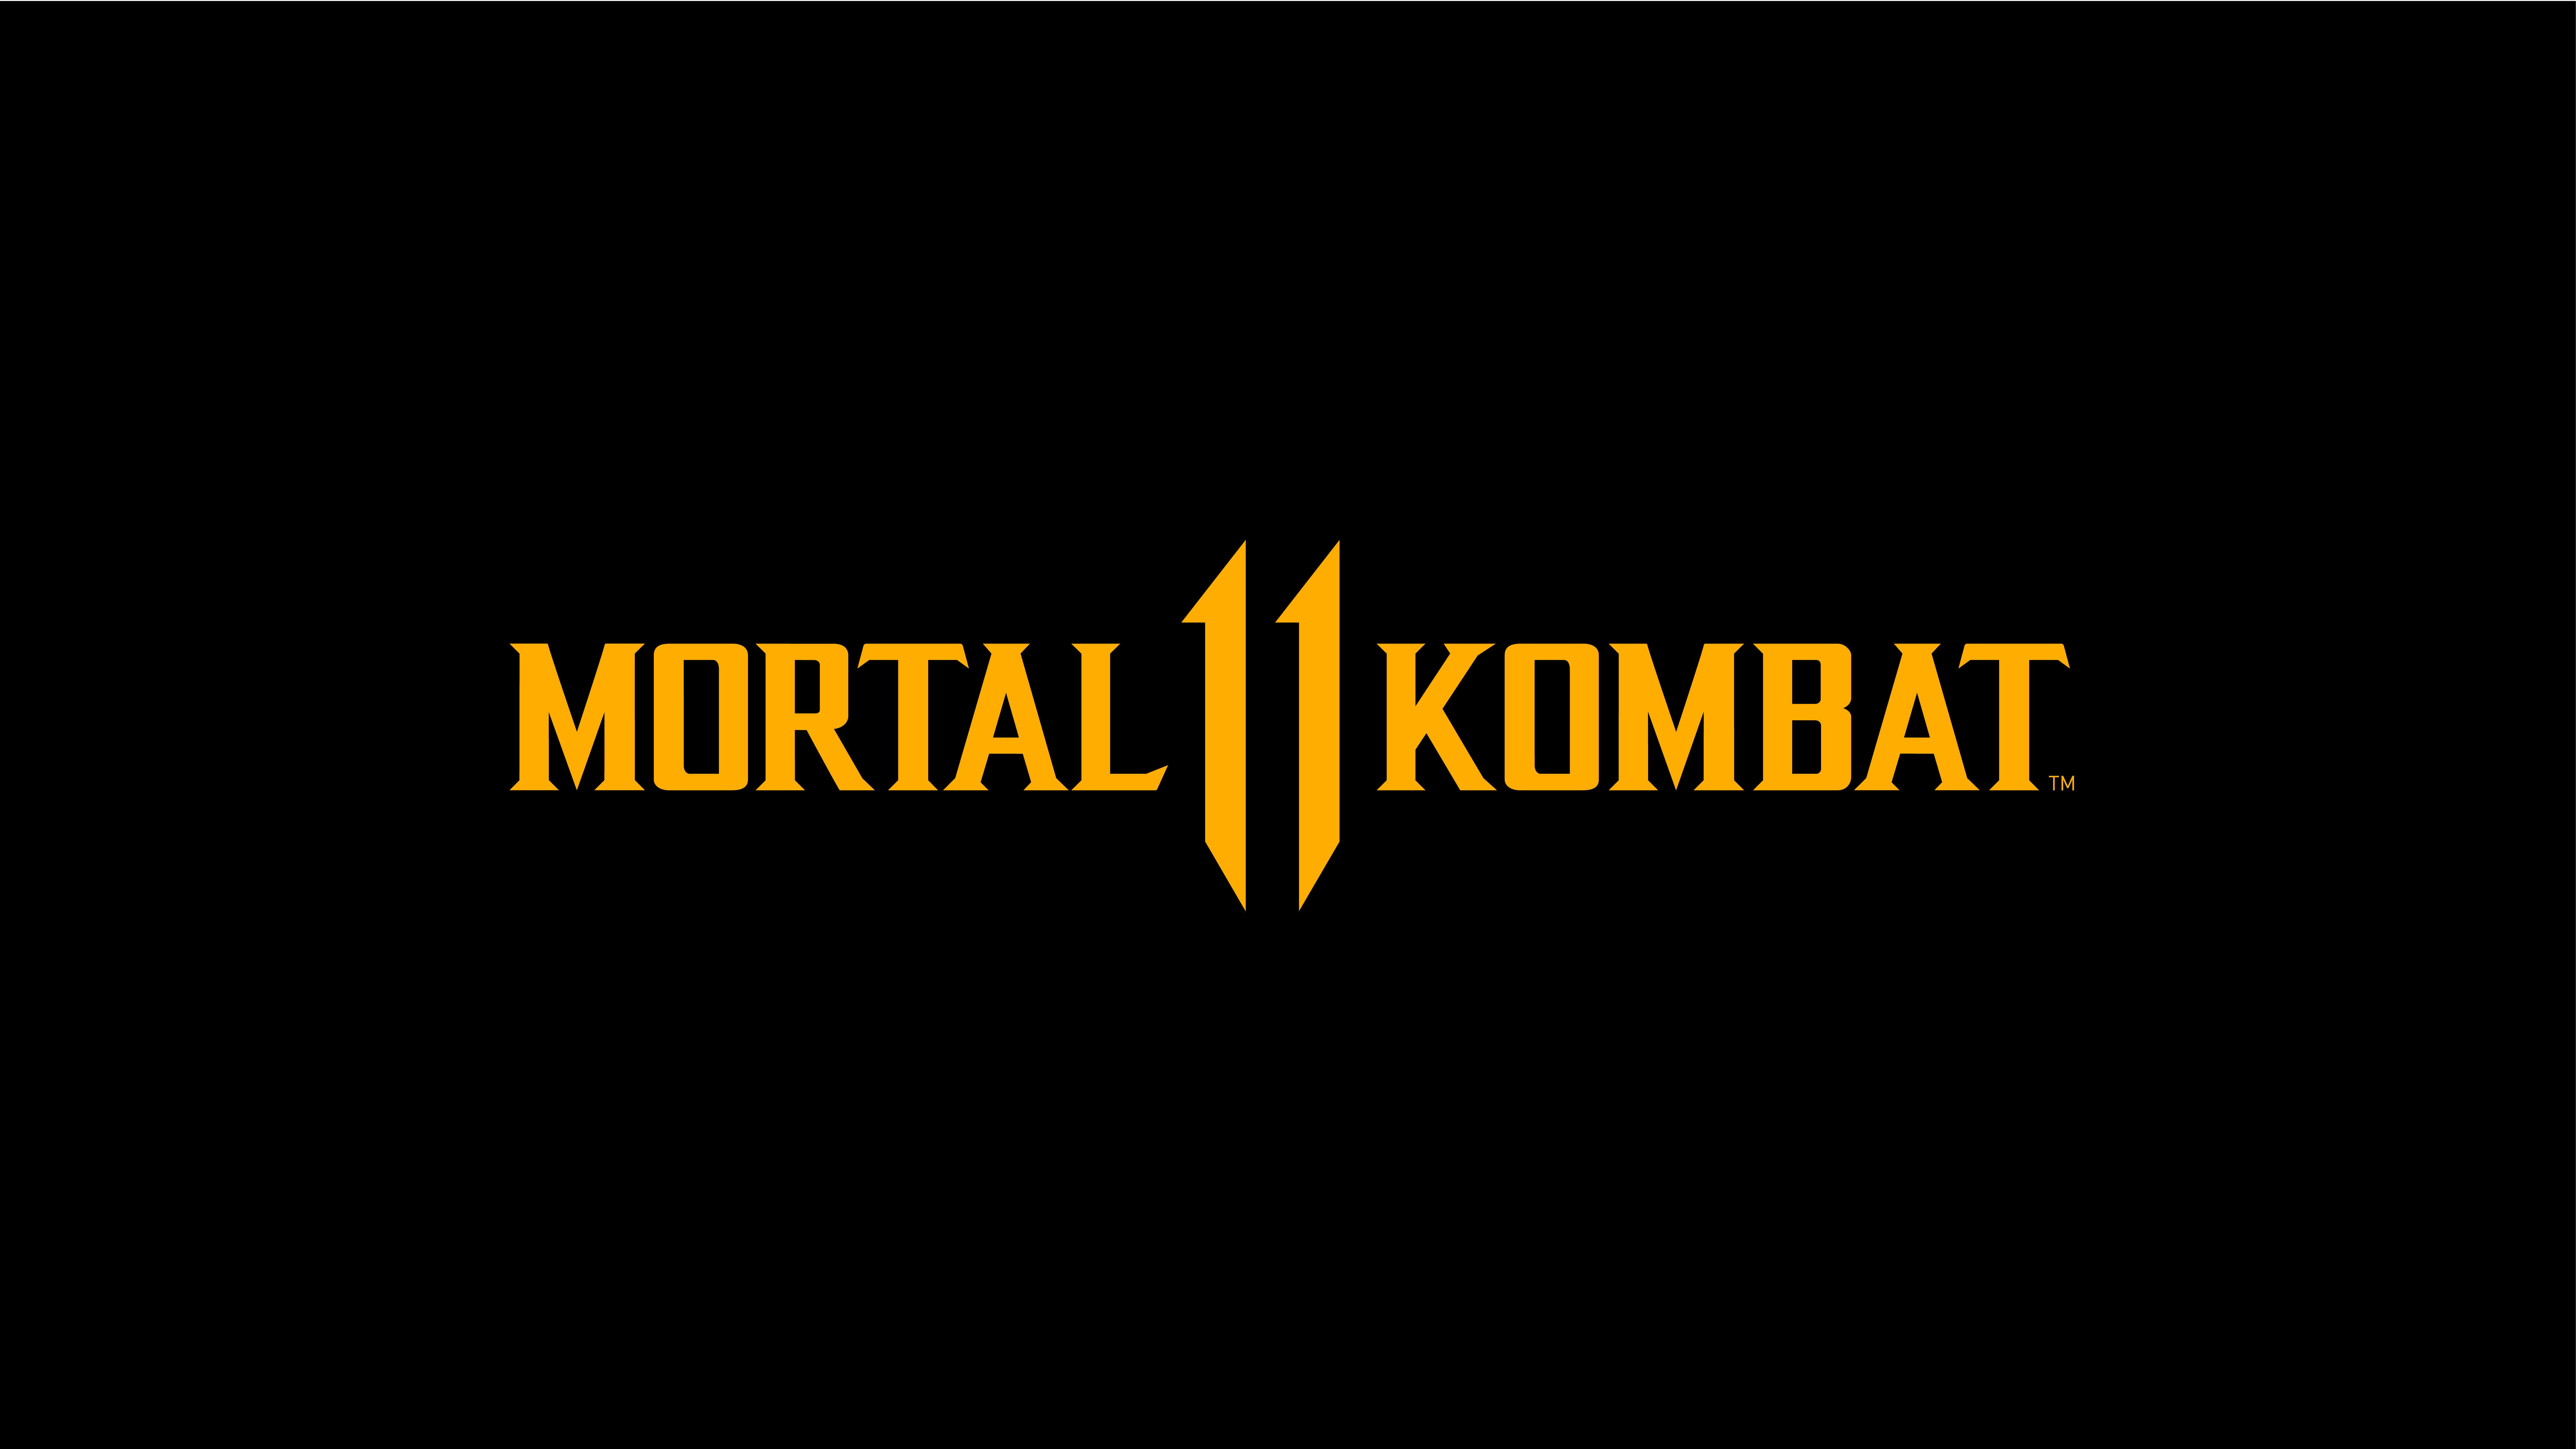 7680x4320 Mortal Kombat 11 Logo Dark Black 8k 8k Hd 4k Wallpapers